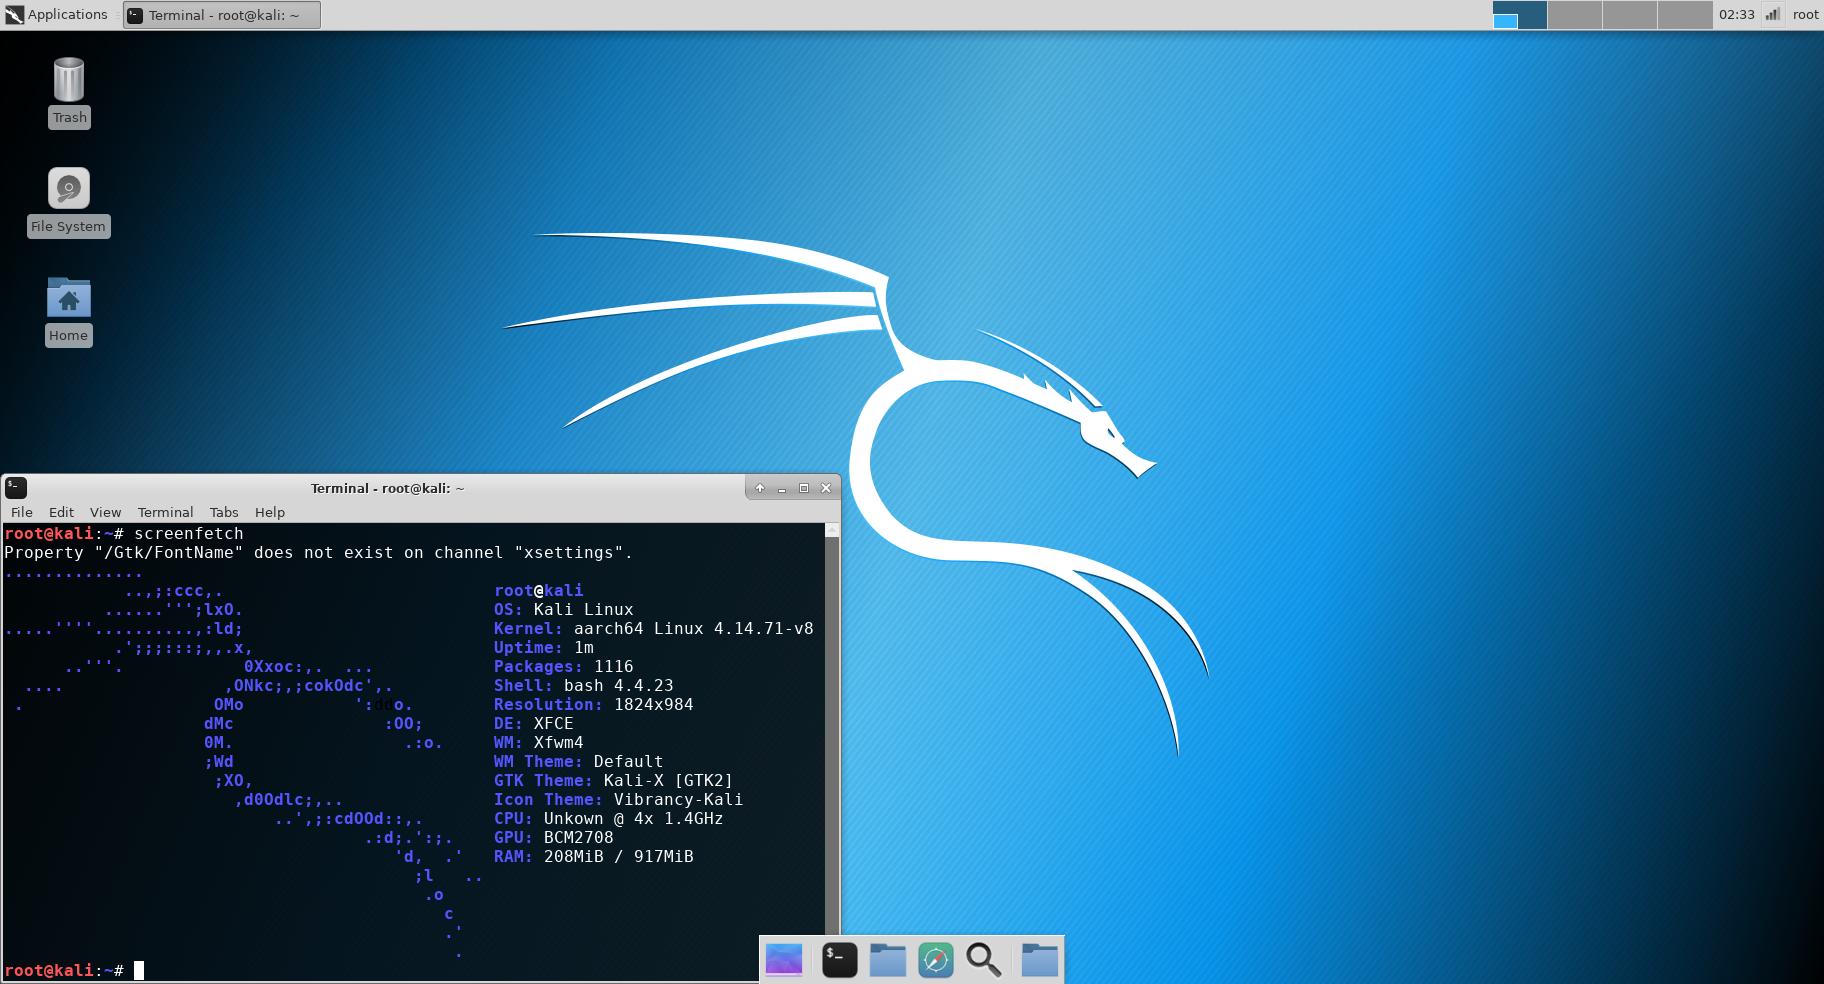 Kali Linux RaspberryPi 3 64bit